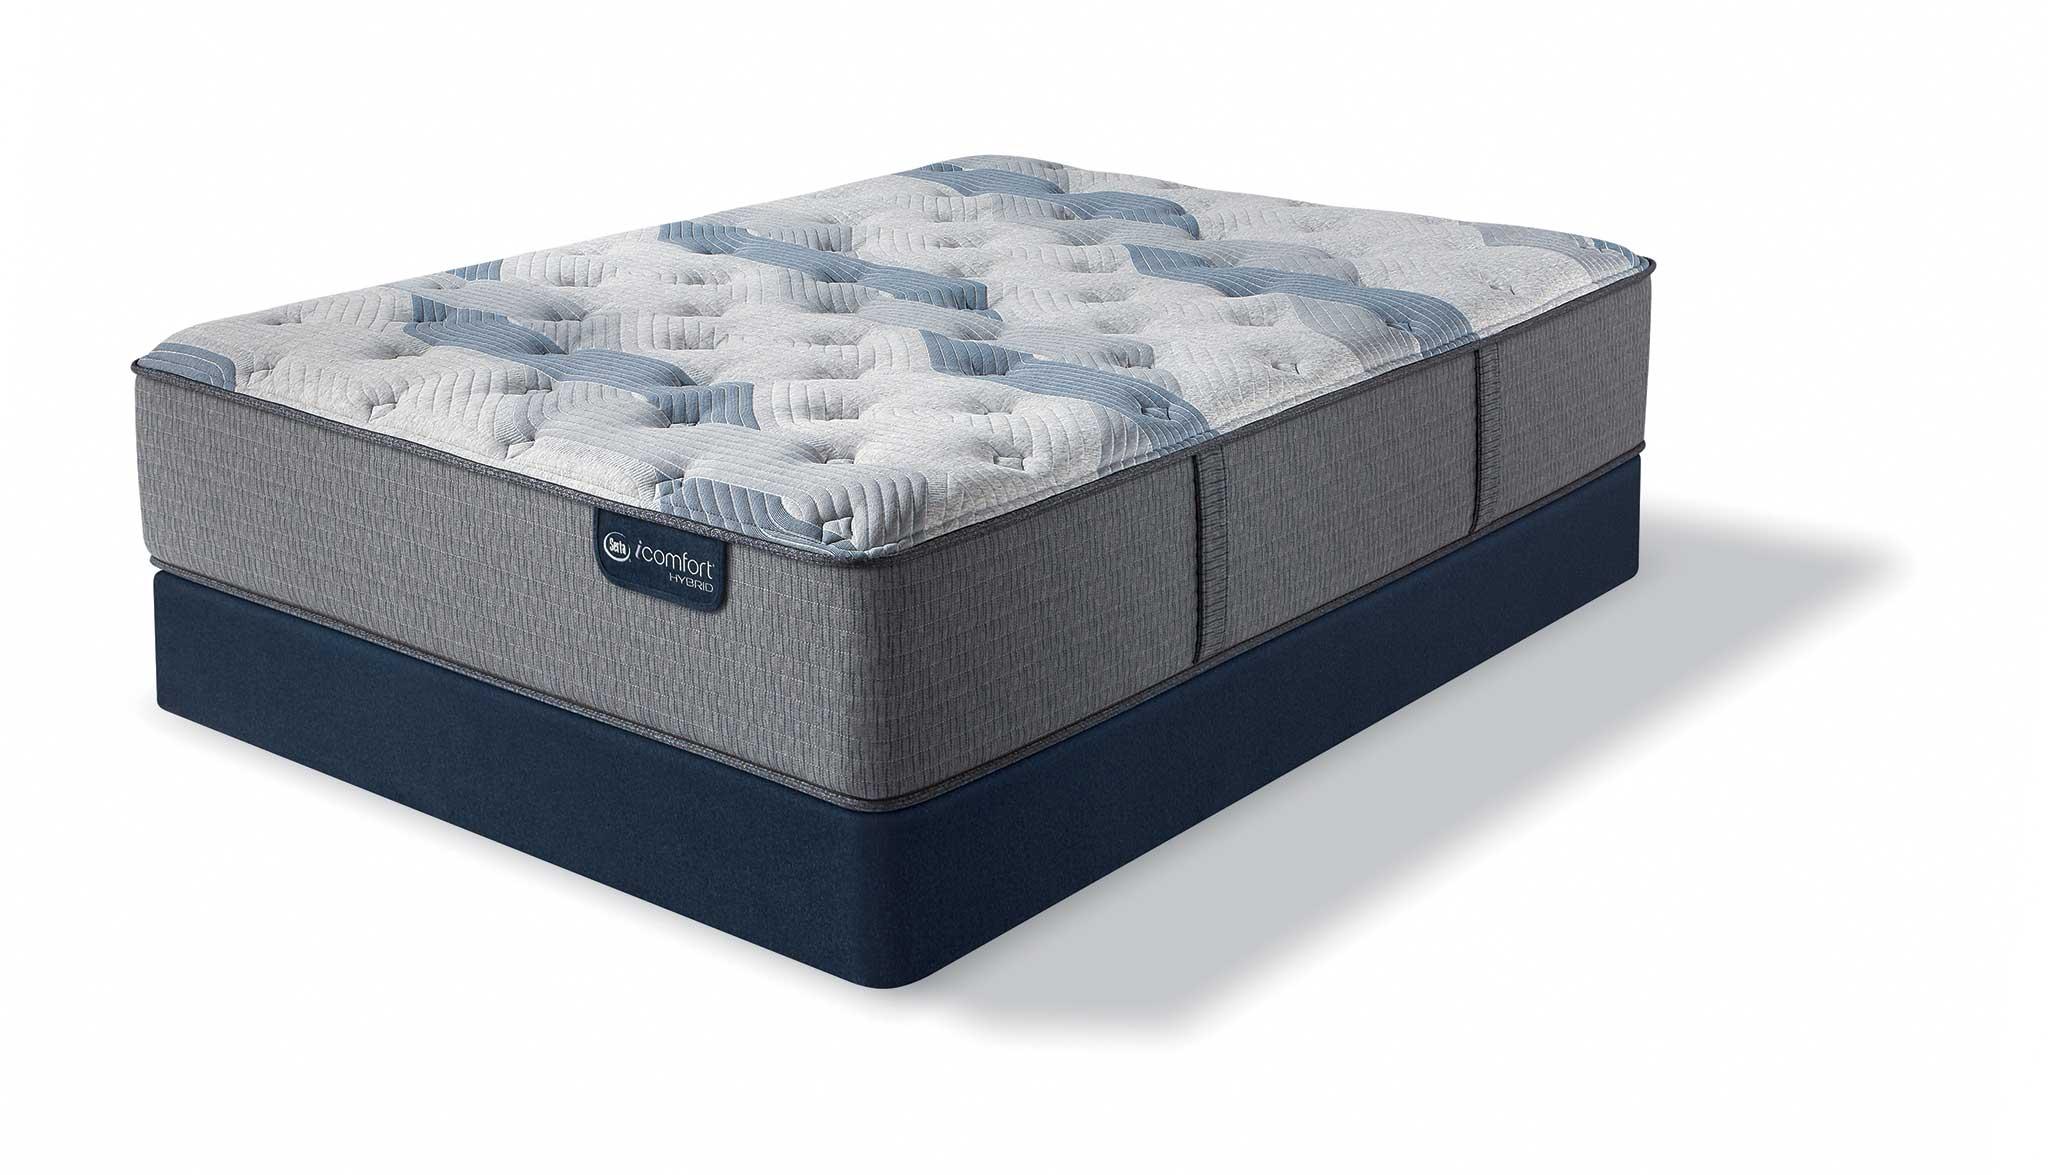 Icomfort Hybrid Blue Fusion 300 Best Mattress Las